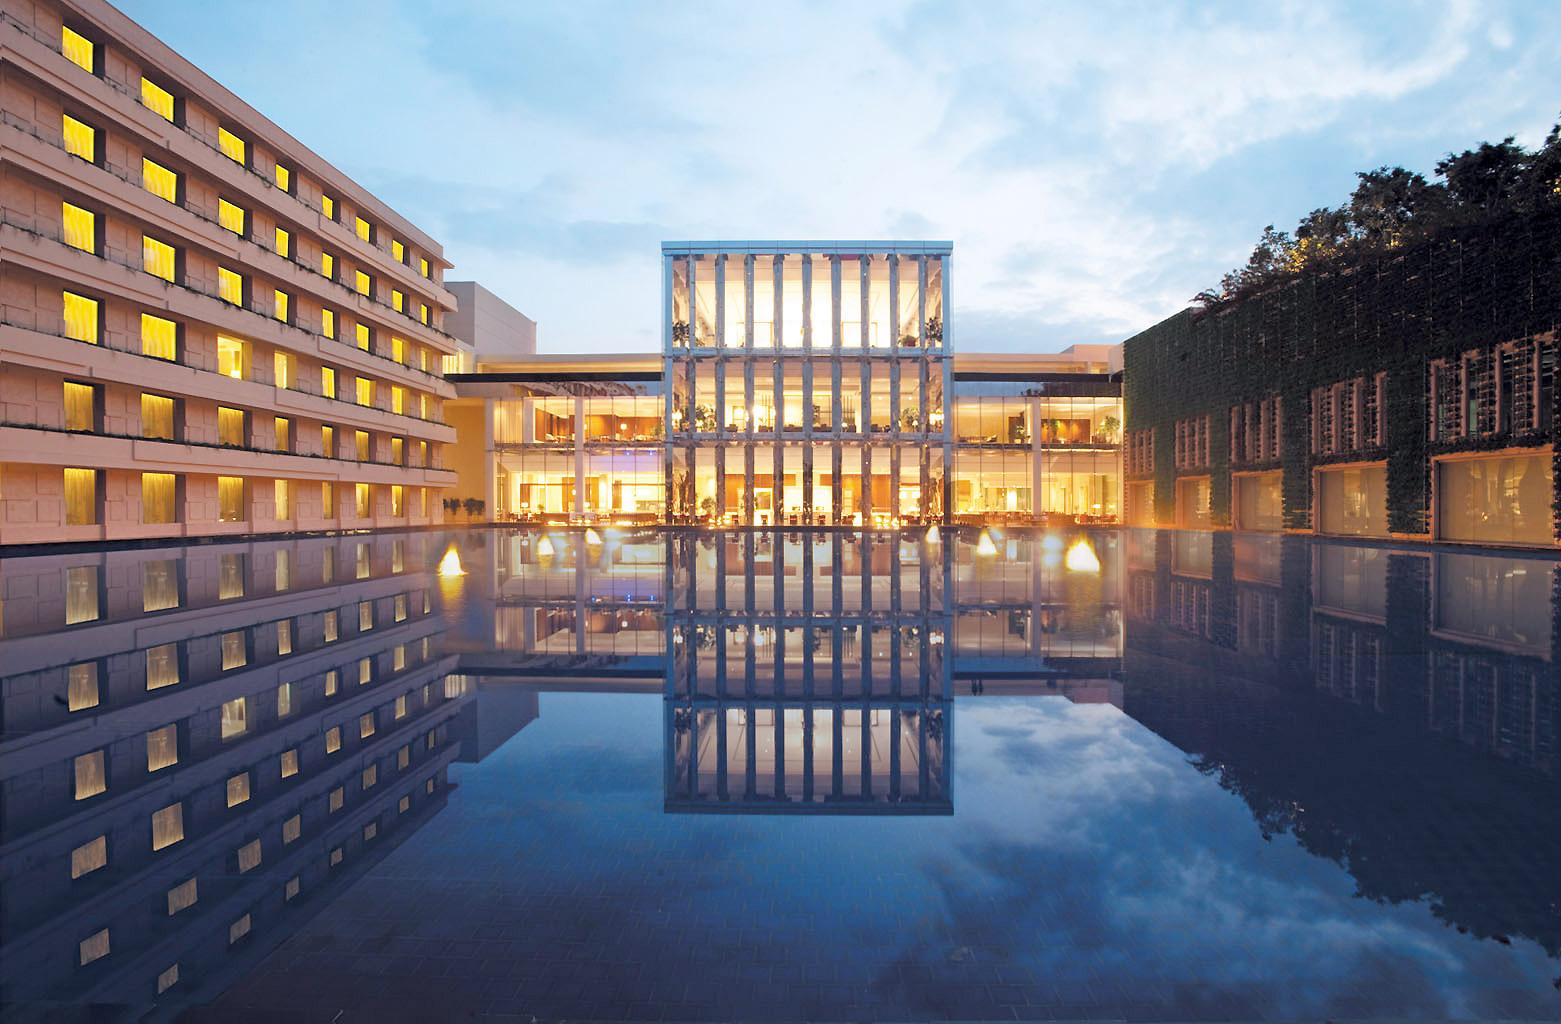 The Oberoi Gurgaon, mejor hotel de lujo de 2013